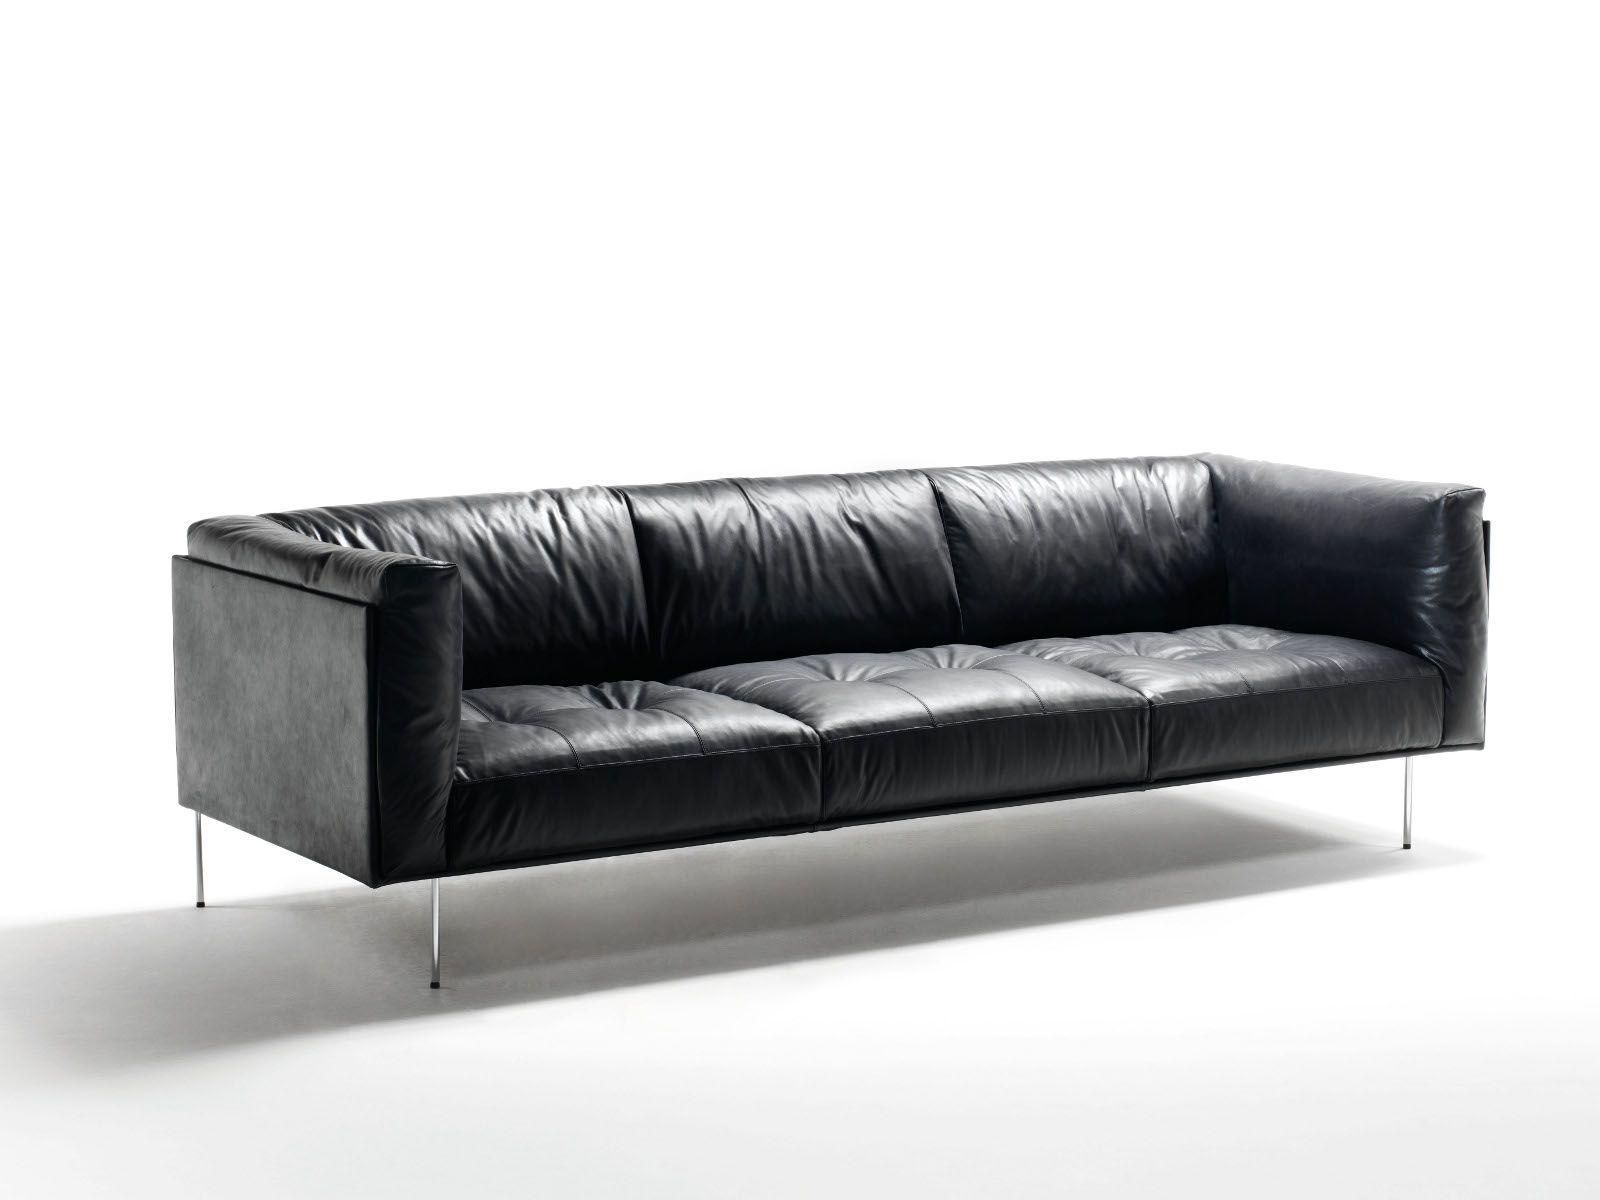 divano rod divano living divani. Black Bedroom Furniture Sets. Home Design Ideas